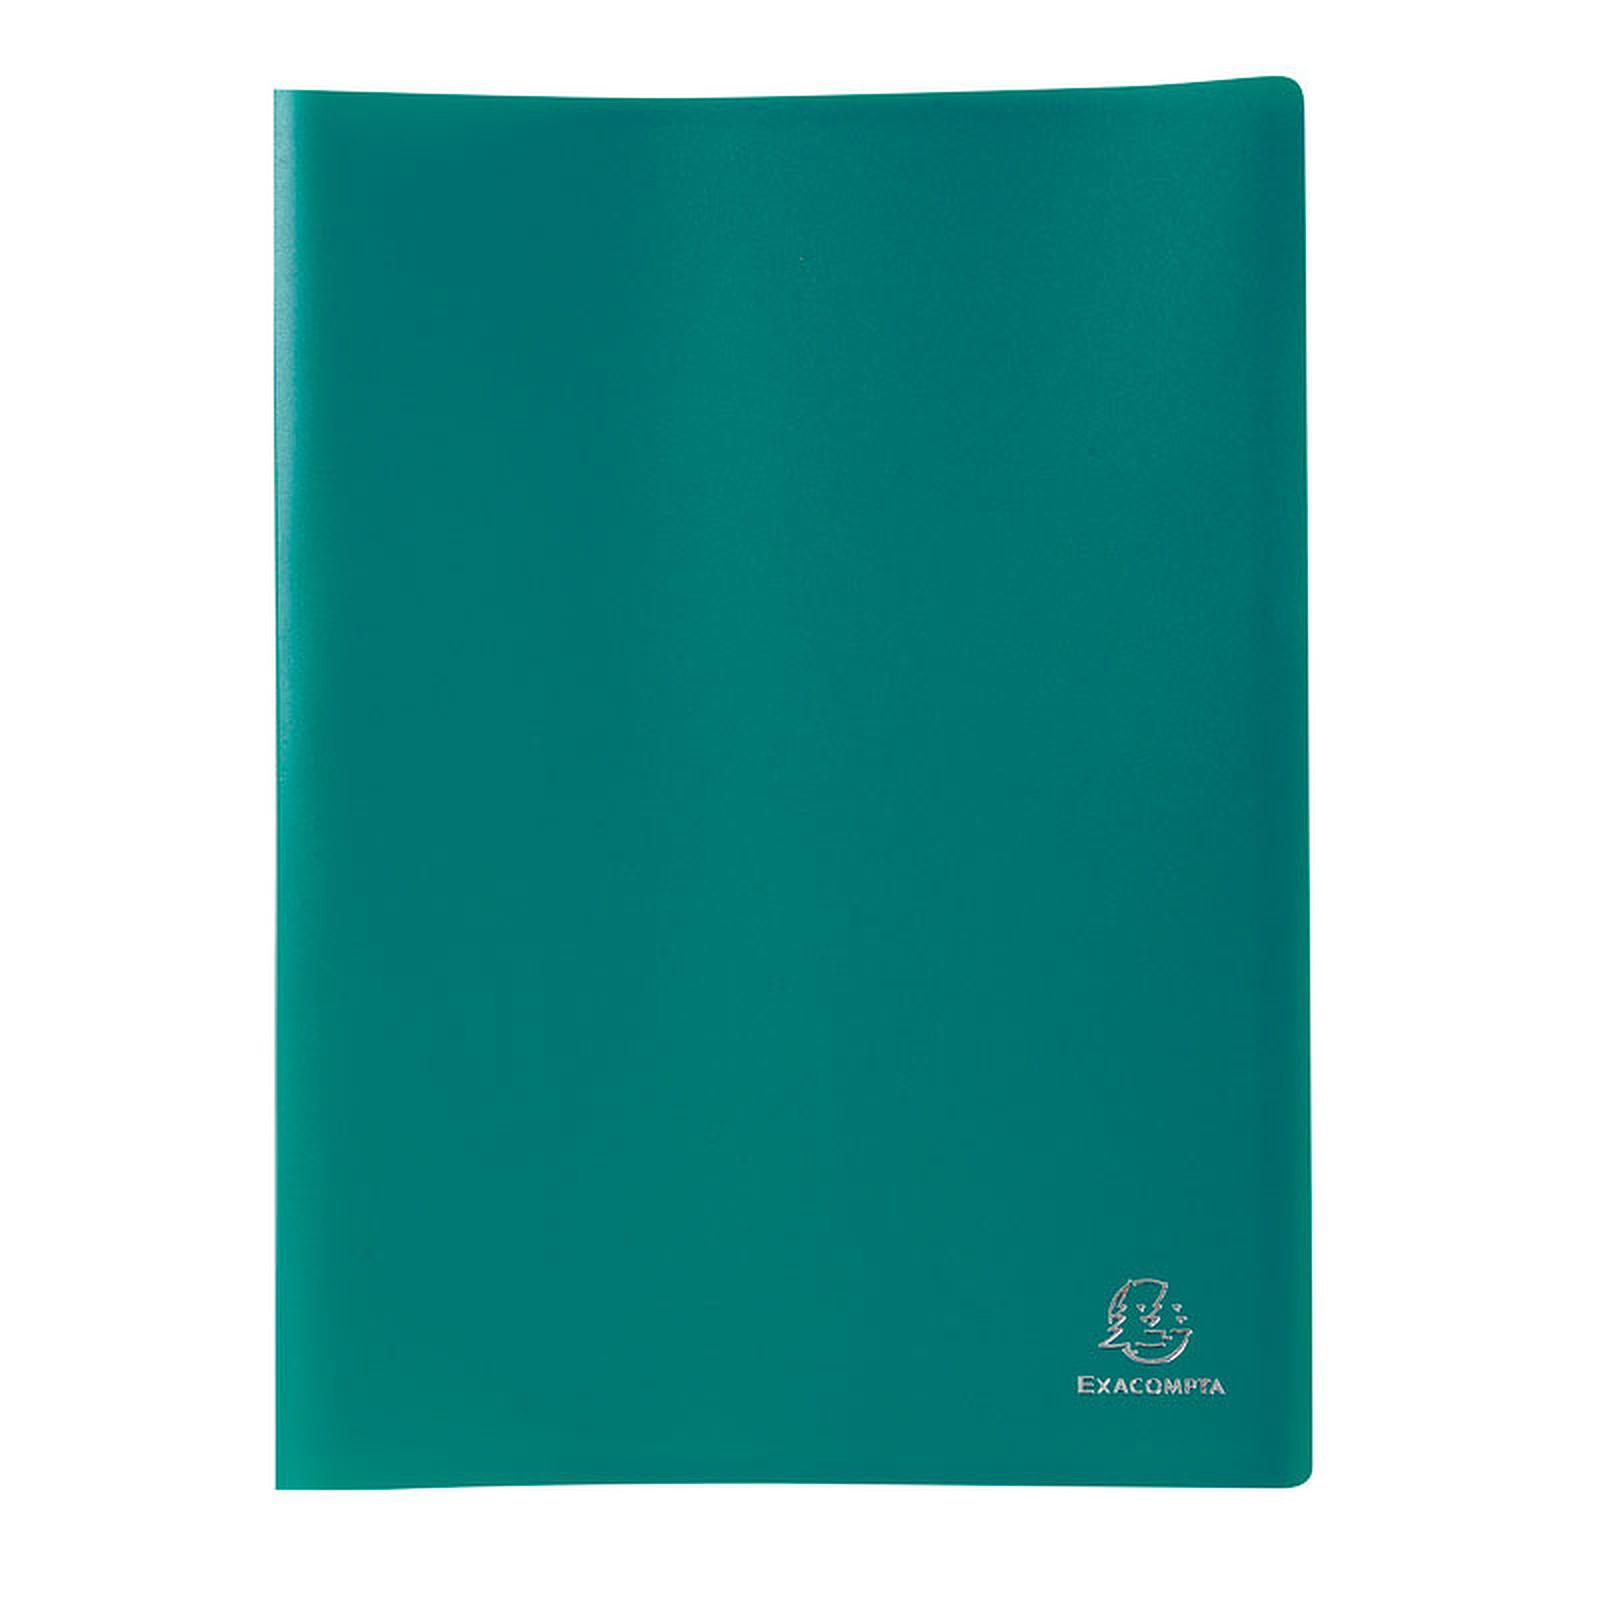 Exacompta Protège-documents A4 160 vues Vert foncé